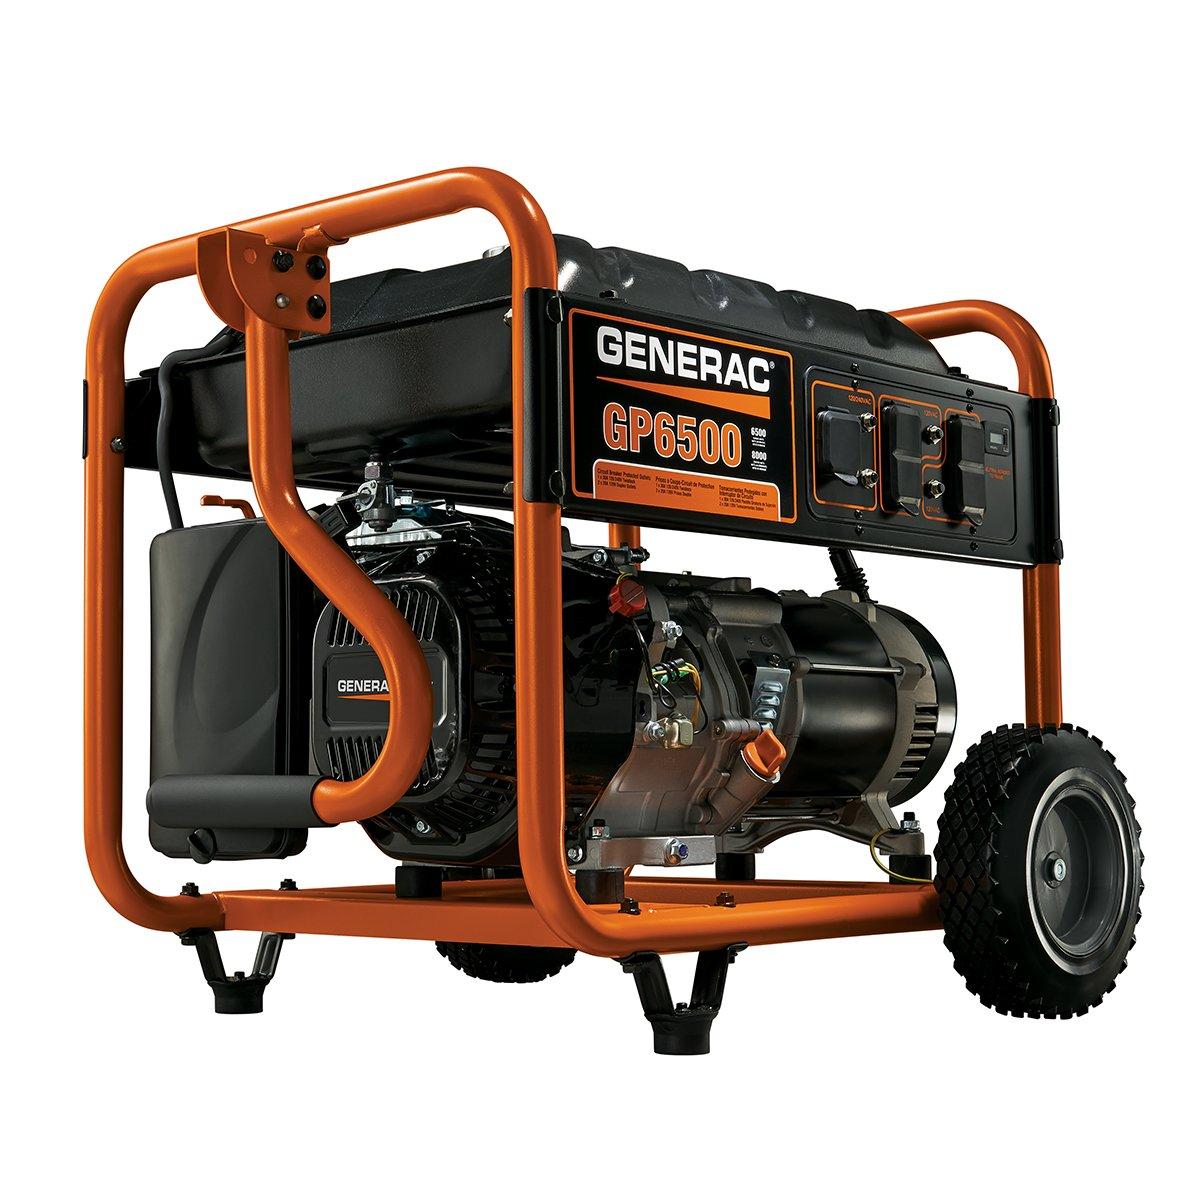 Amazon.com : Generac 5940 GP6500 6500 Running Watts/8000 Starting Watts Gas  Powered Portable Generator : Garden & Outdoor